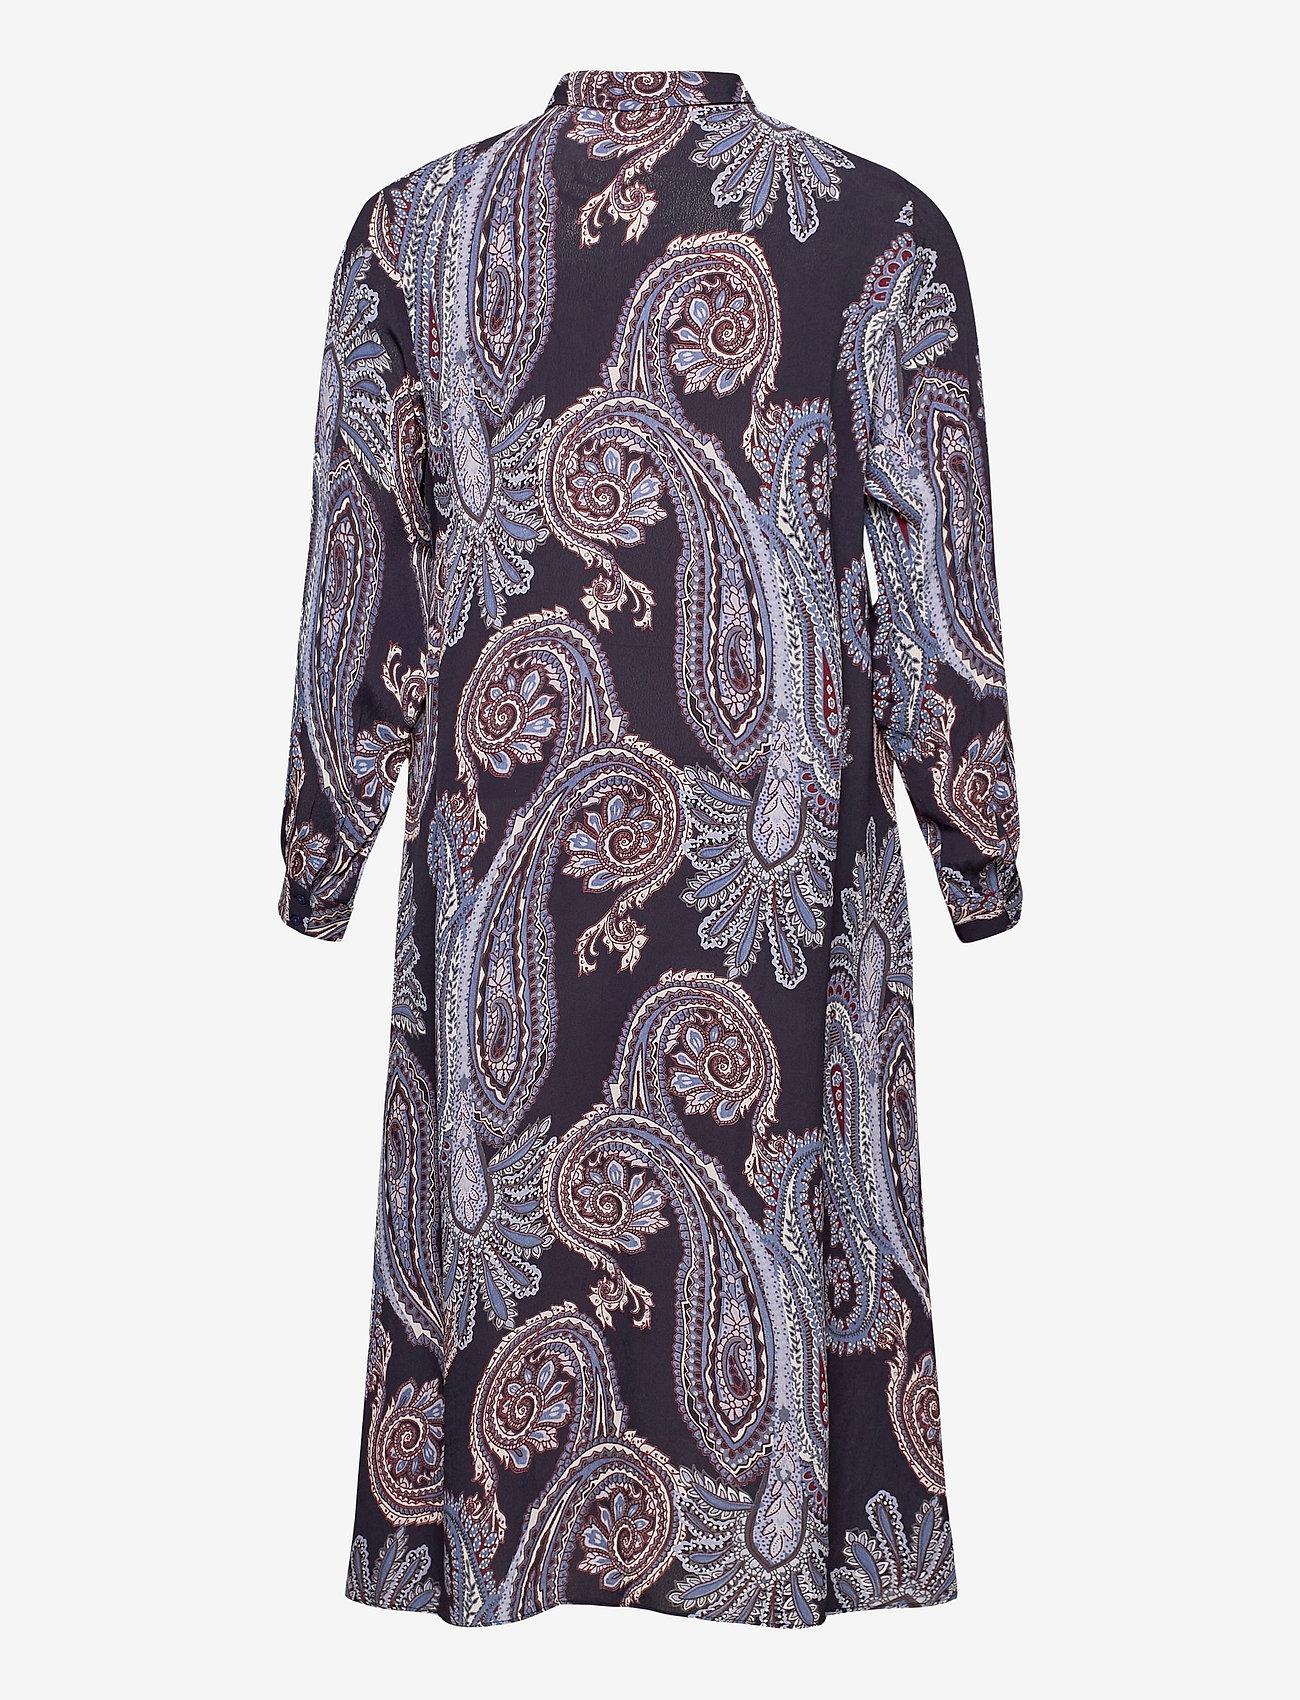 Zizzi - Dress Print Plus Size Long Sleeves Collar - alledaagse jurken - dark blue - 1